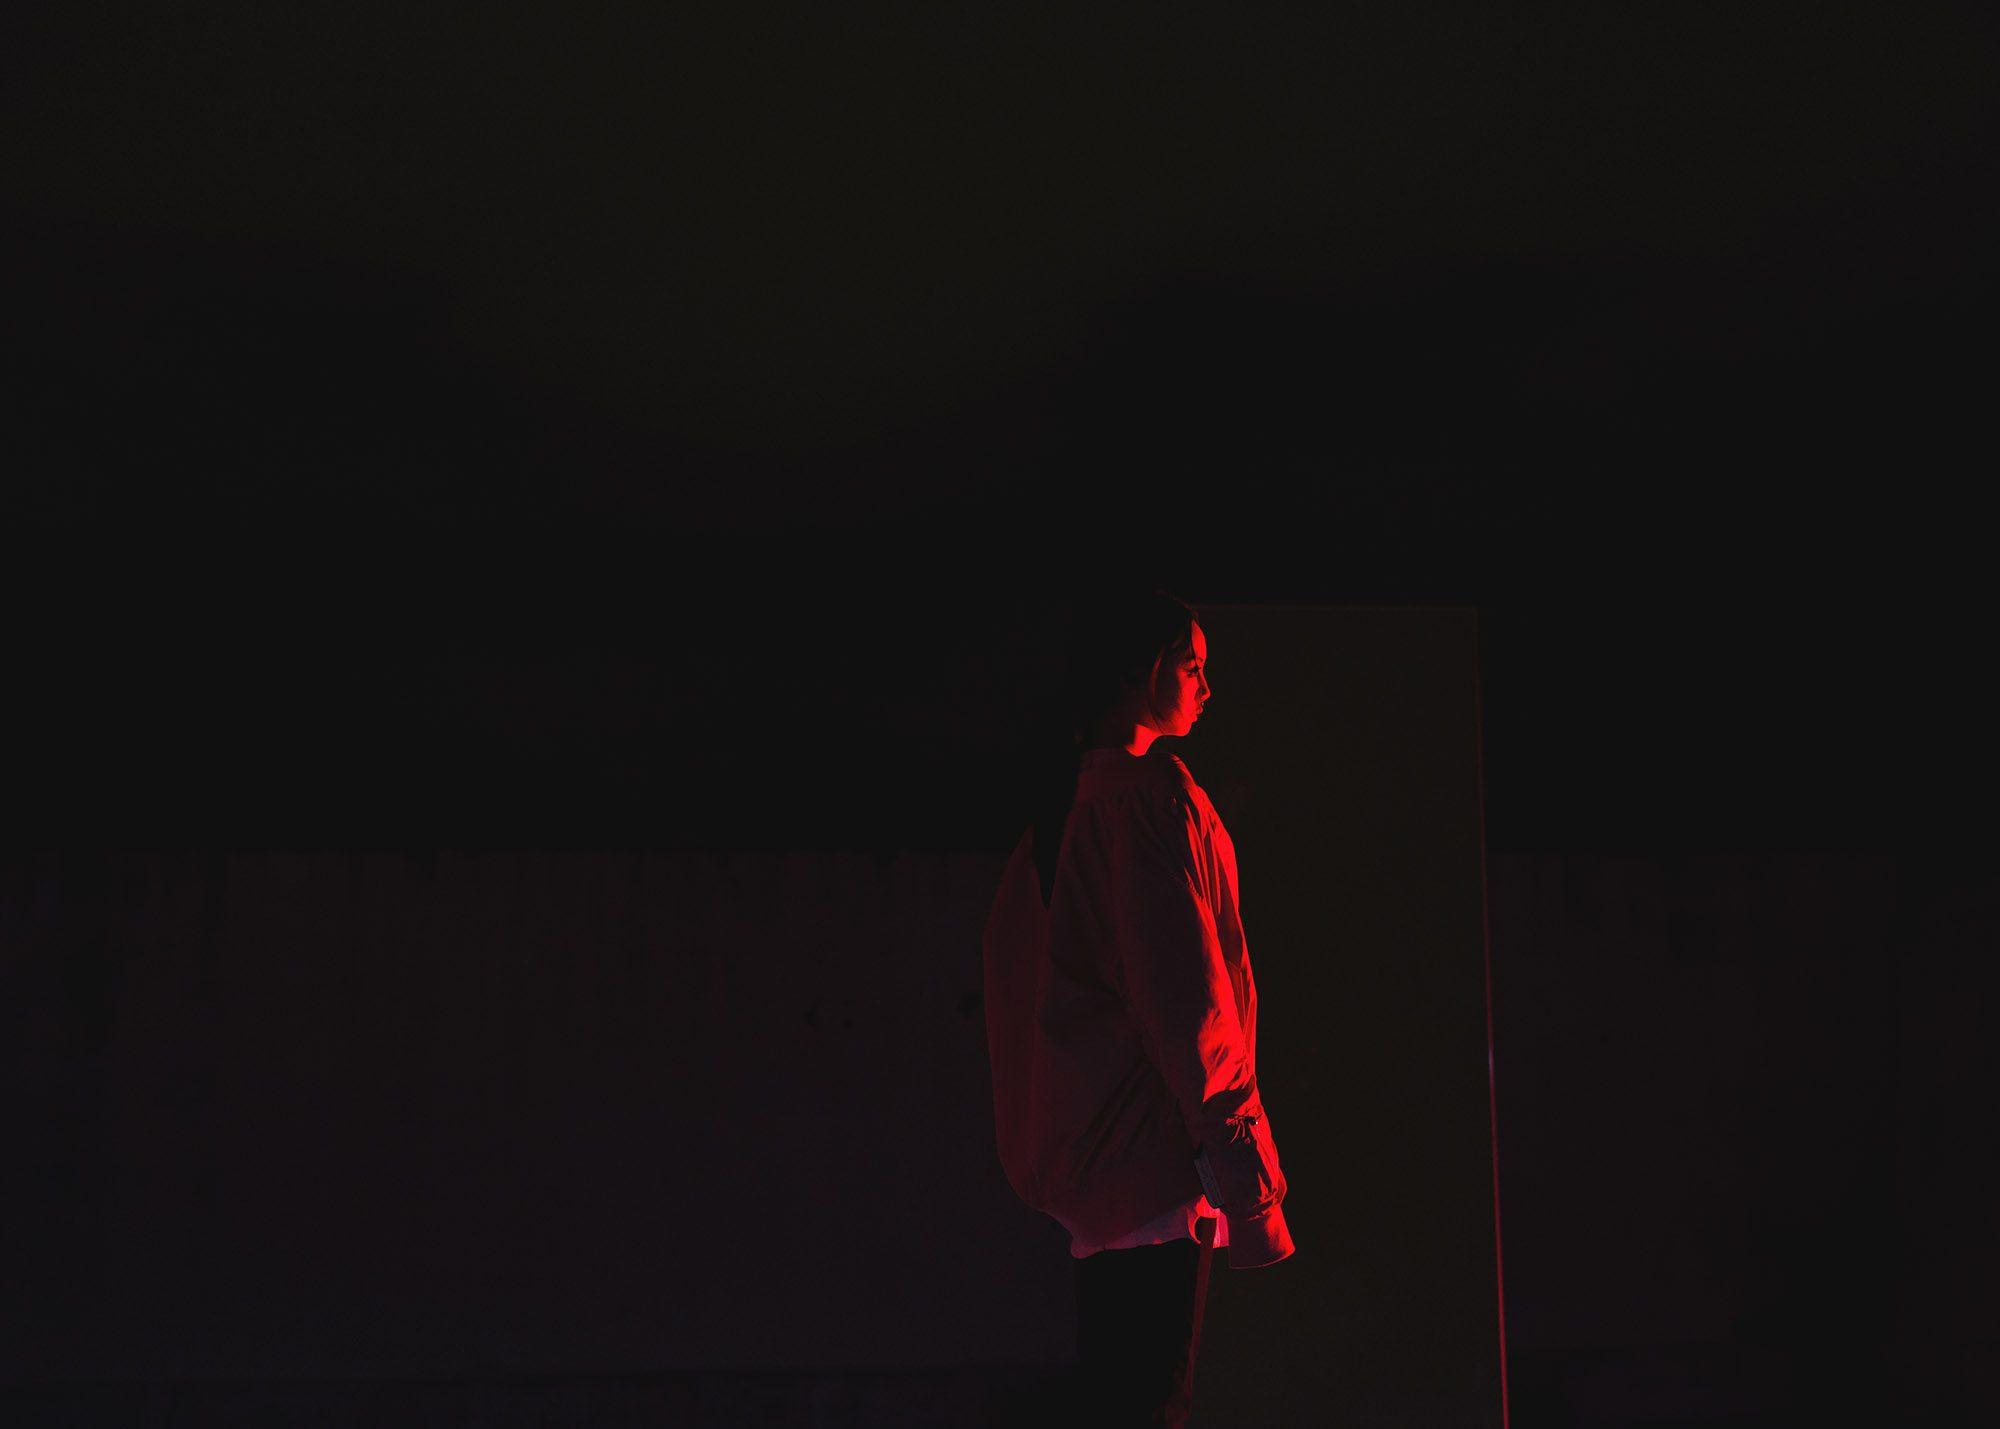 remix11